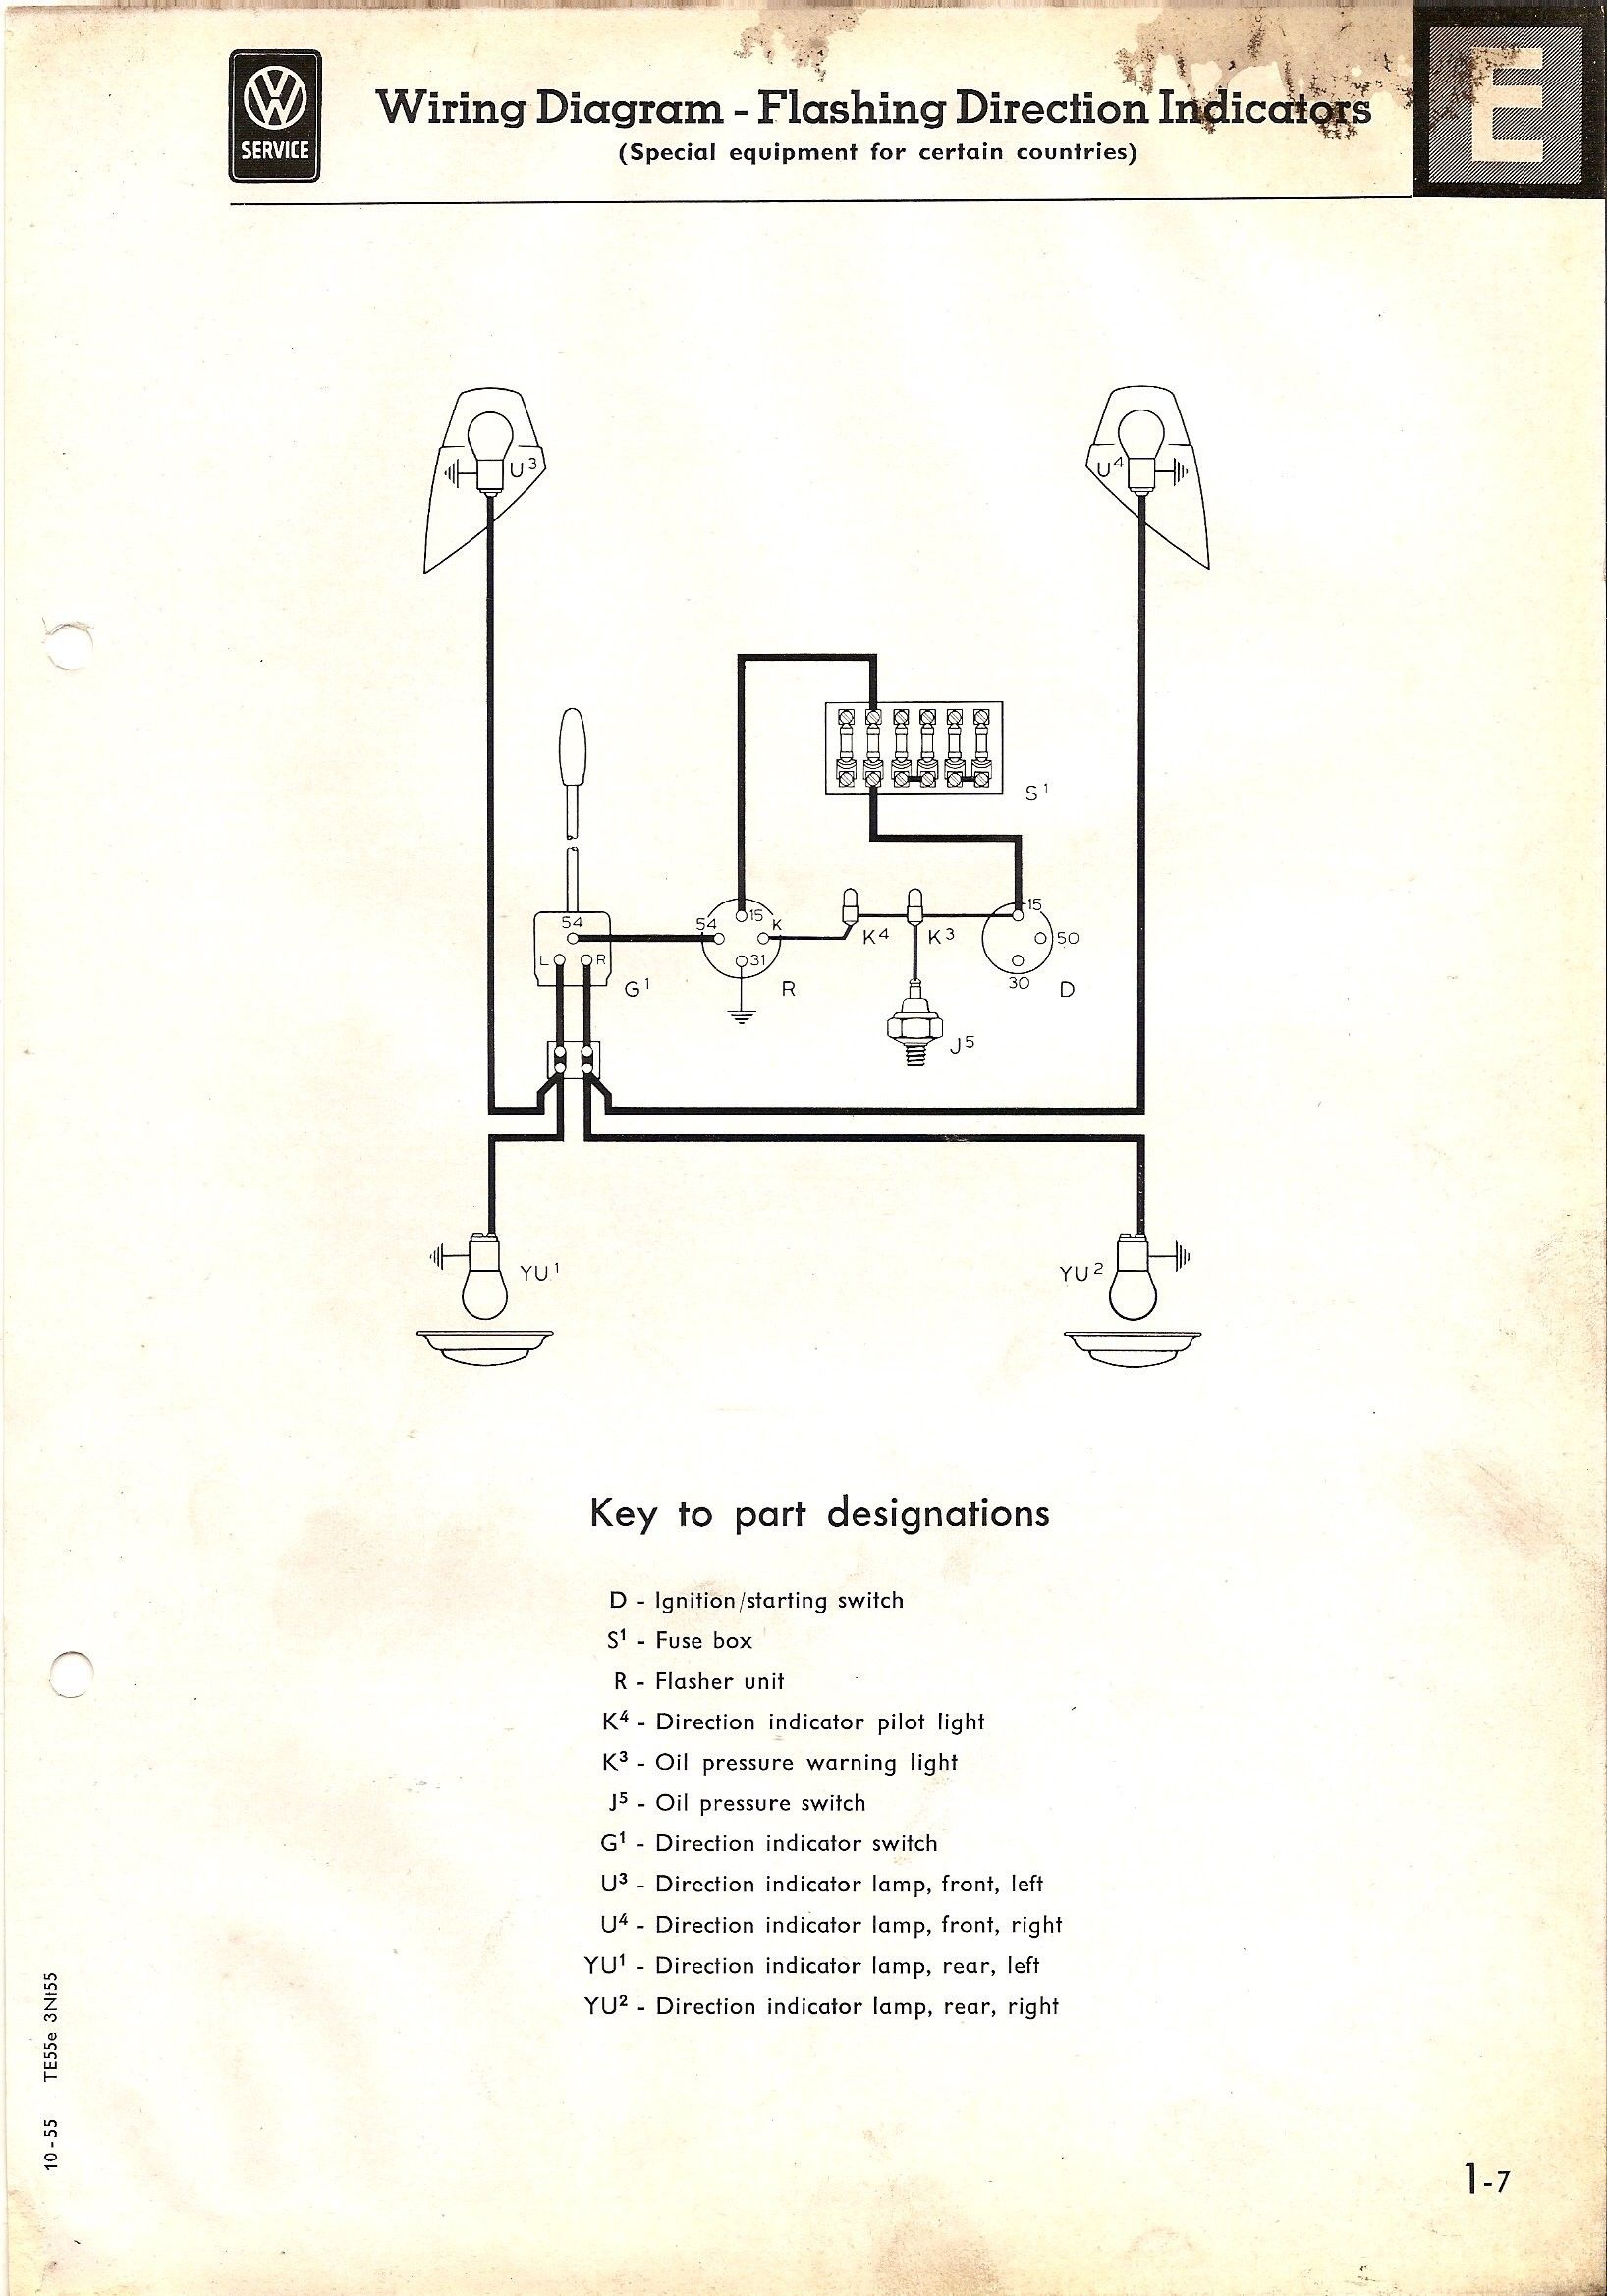 New Mk Emergency Key Switch Wiring Diagram Diagram Diagramsample